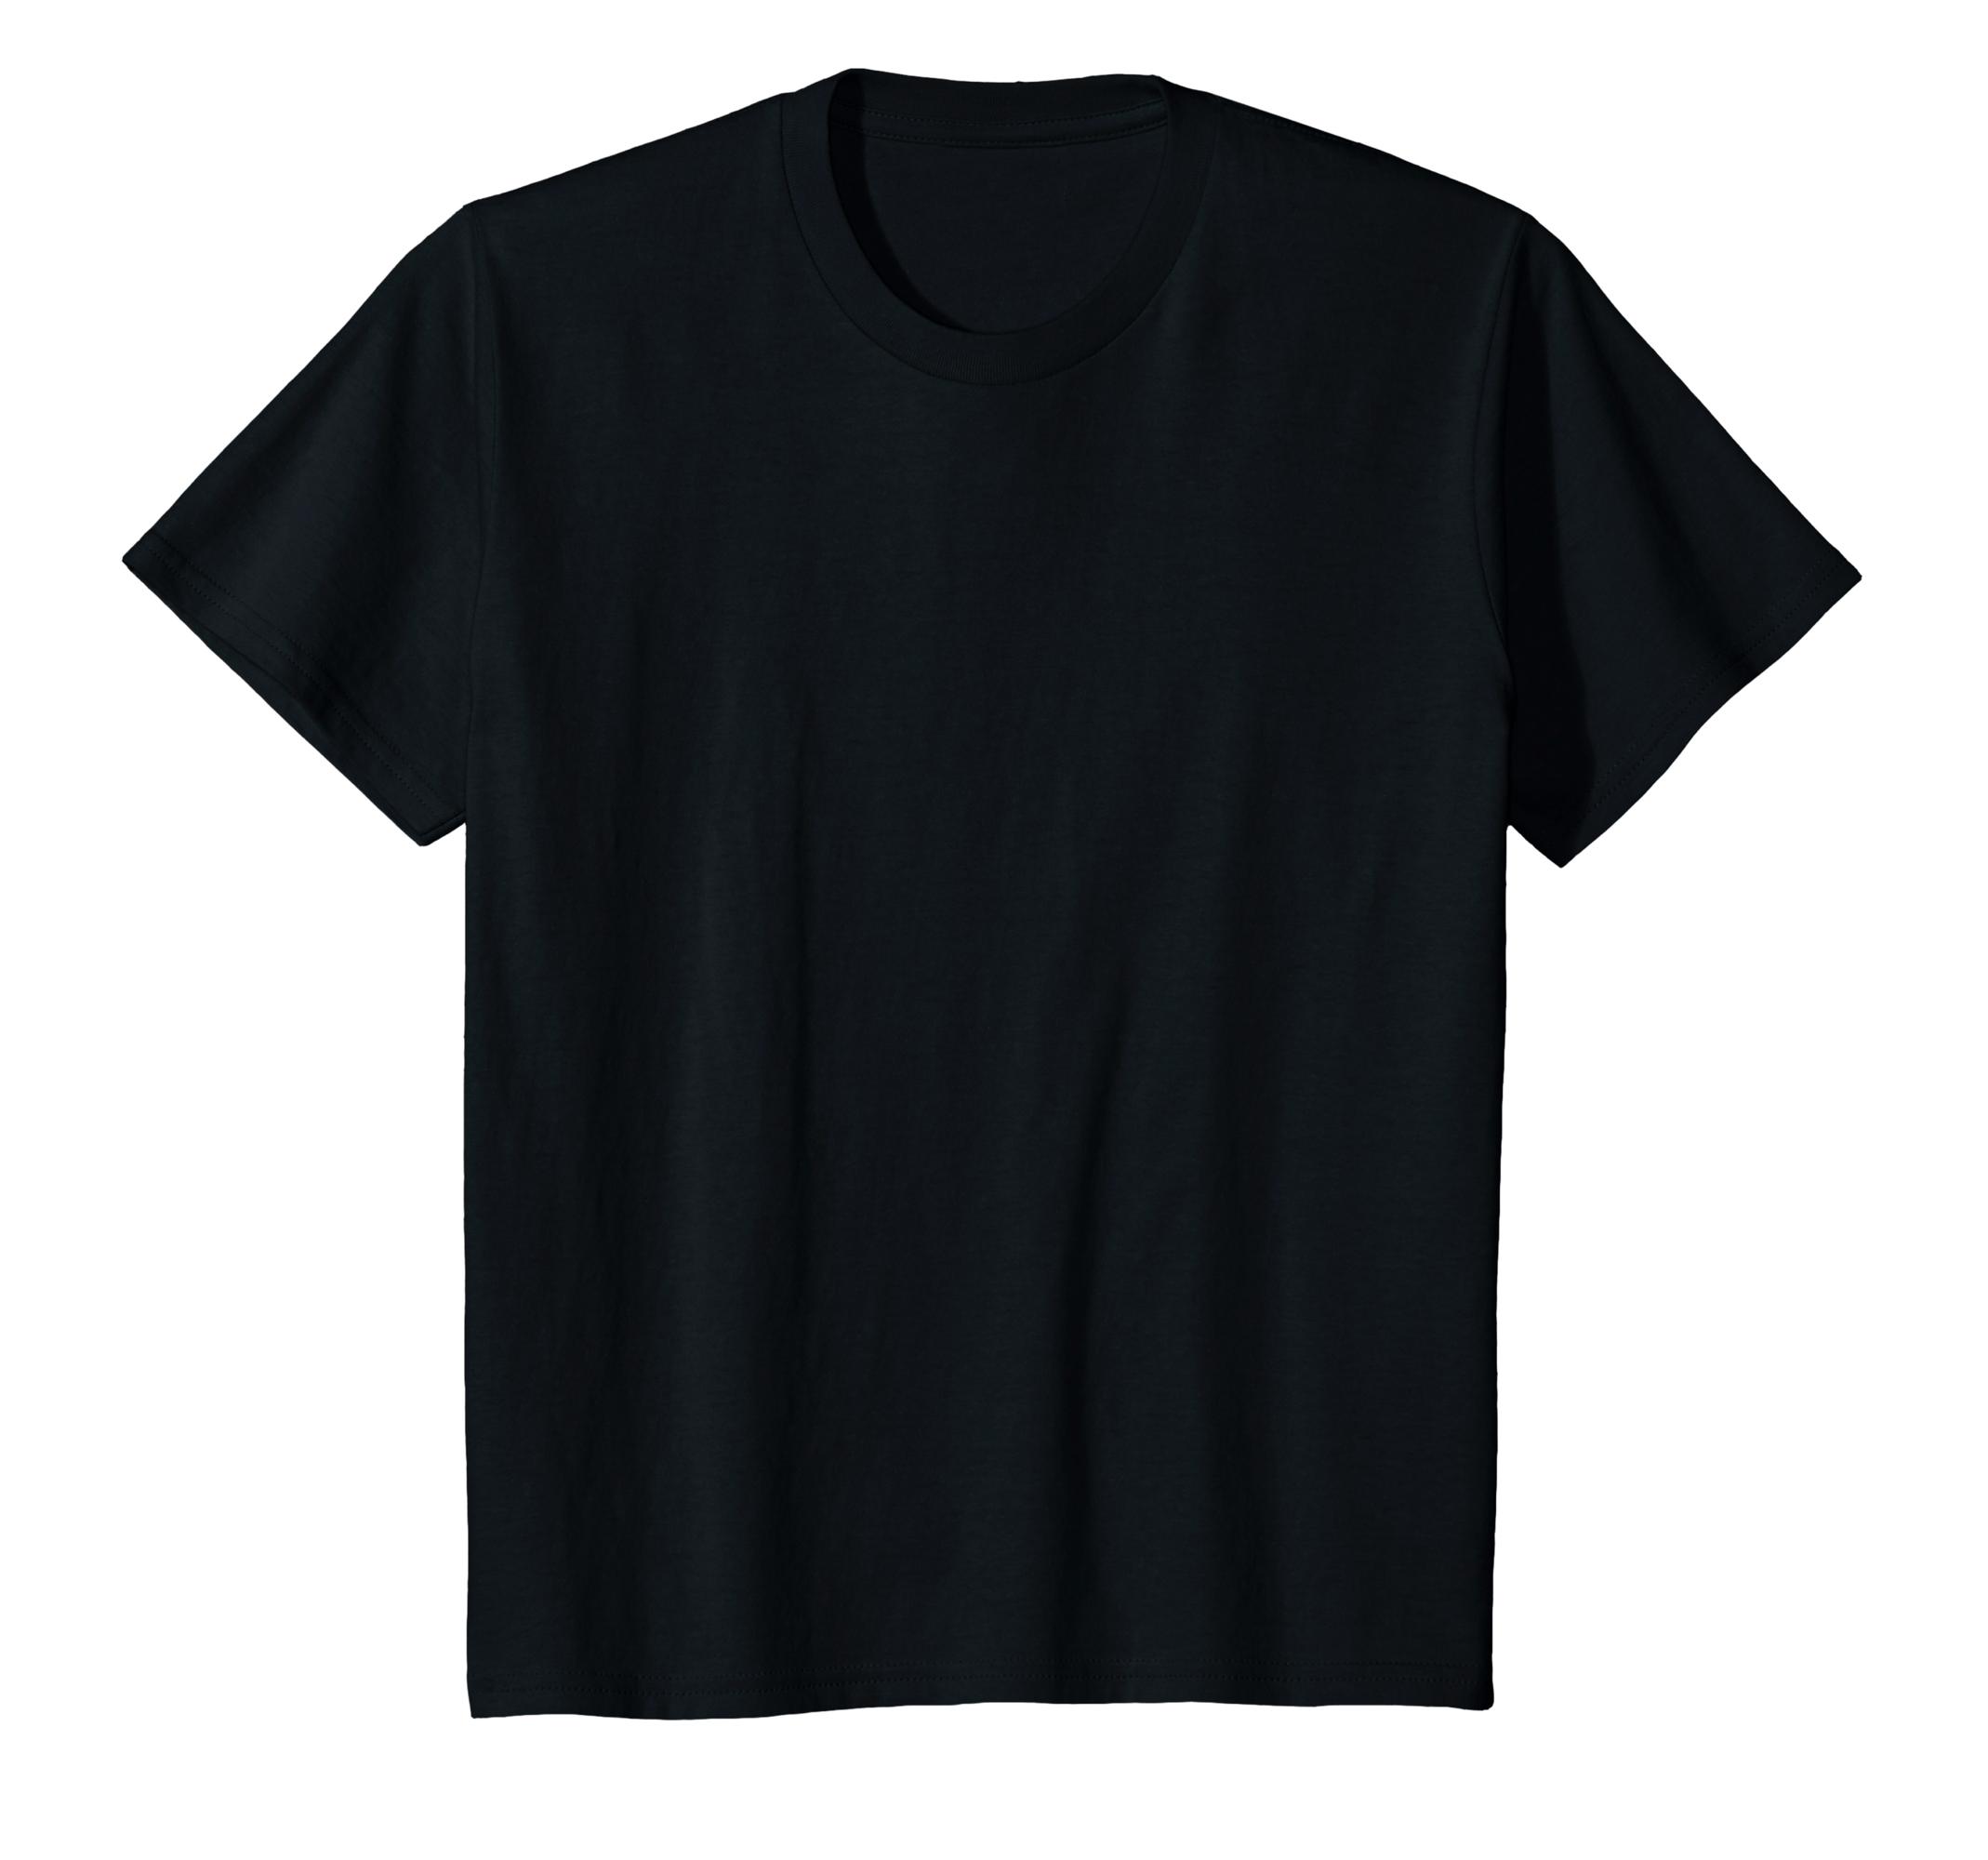 T-shirts Footballer Player Of Match Mens T-shirt T-shirt Casual Short Sleeve For Men Clothing Summer Cotton Fashion Men T Shirt Tops & Tees Goal